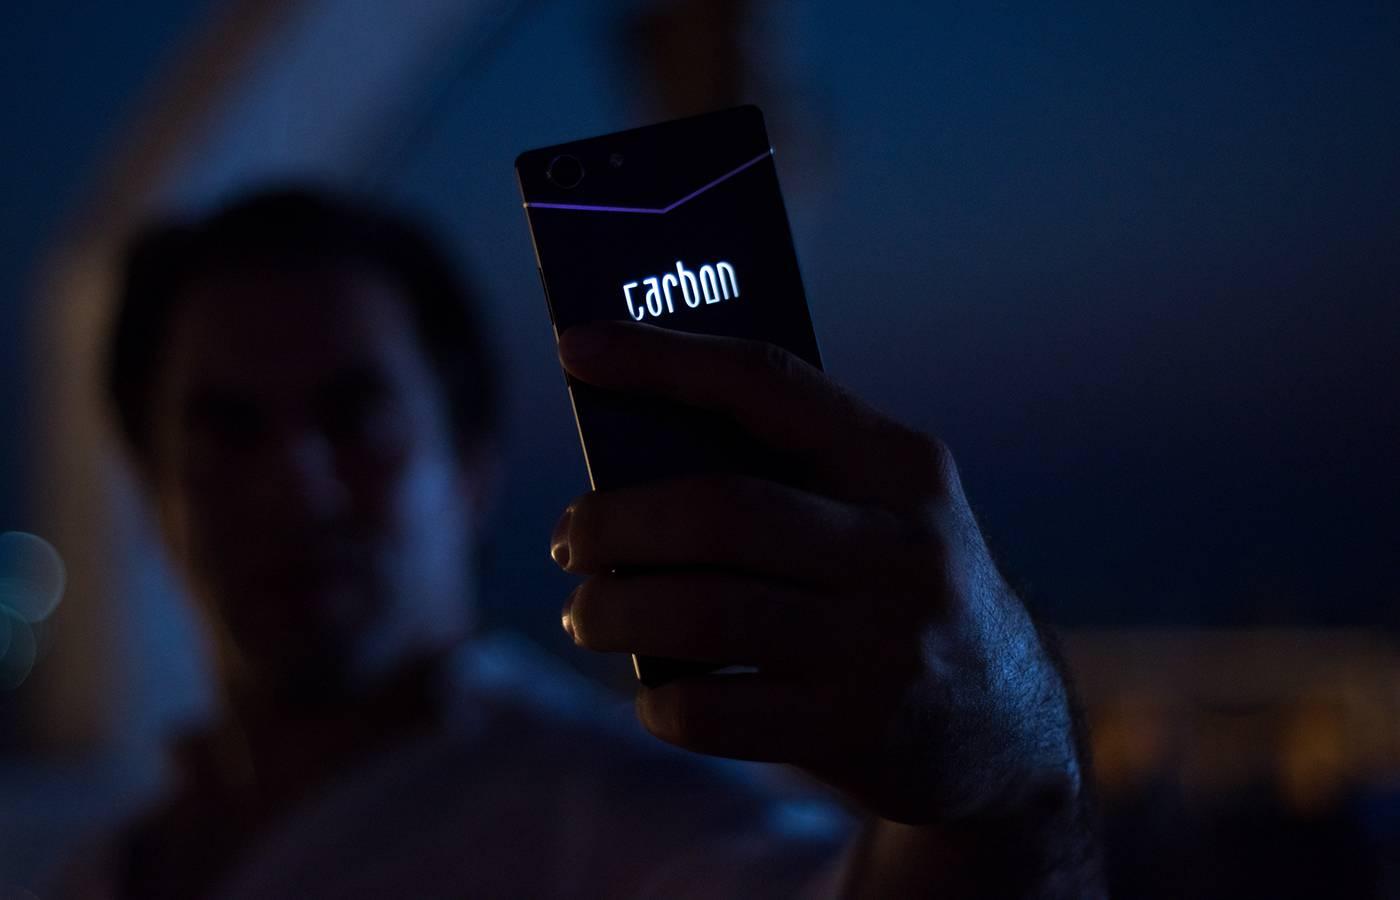 轻薄CARBON手机设计